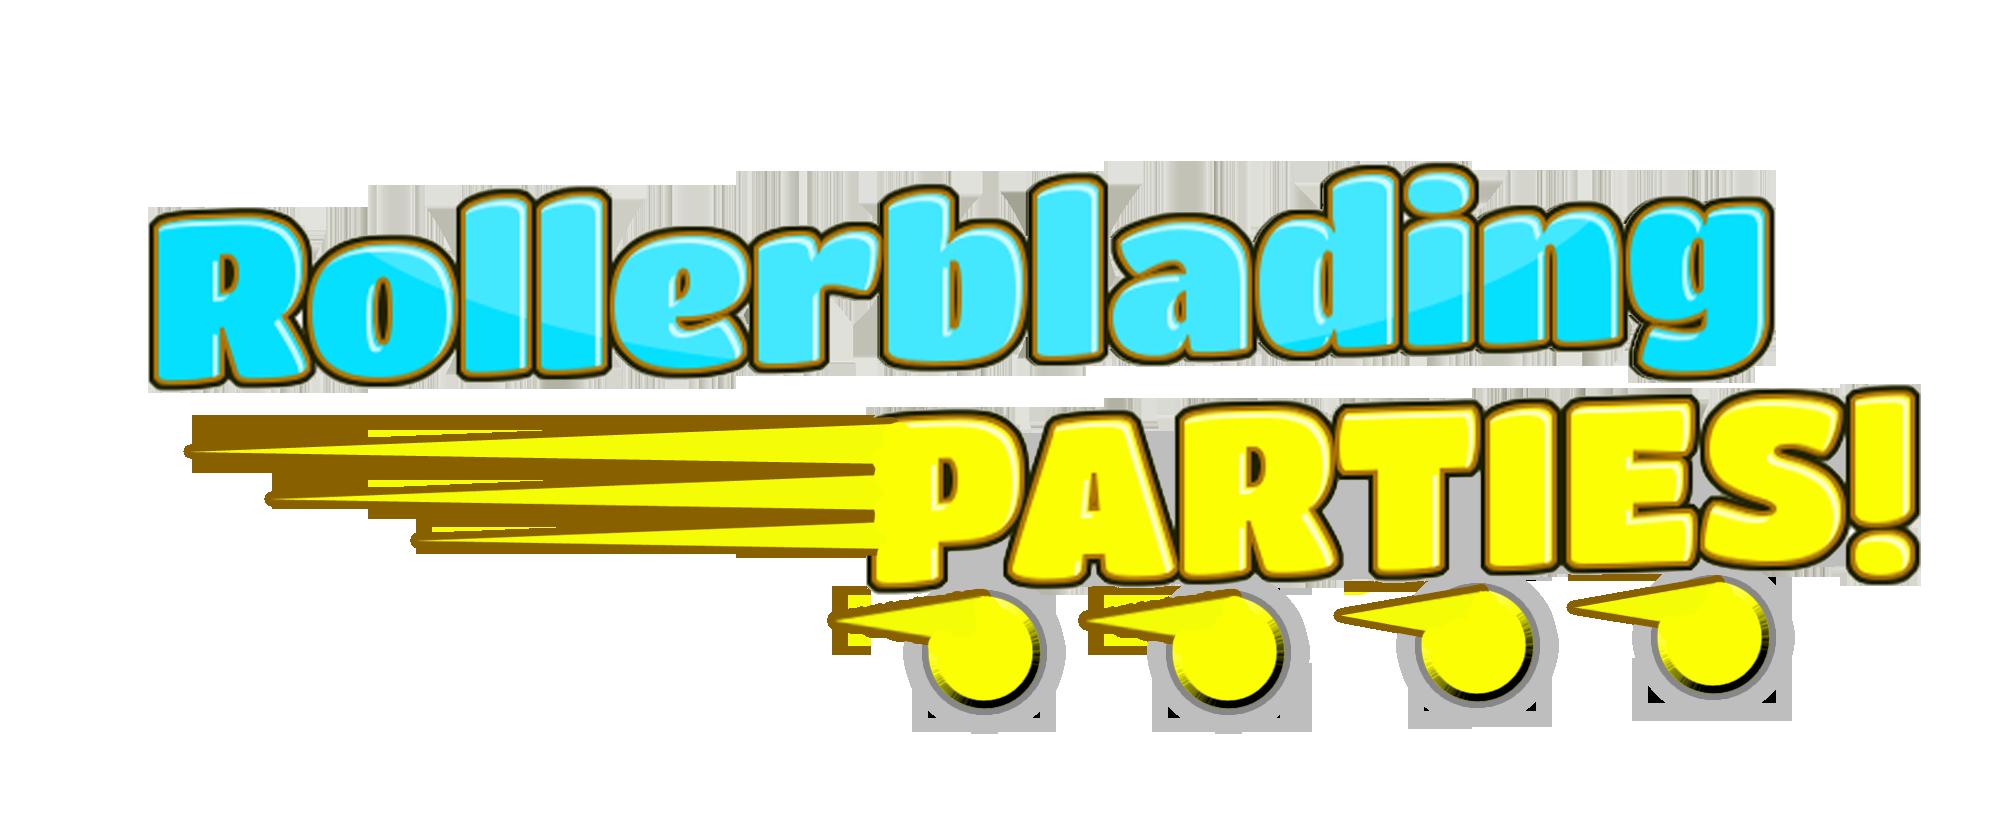 rollerbladingparties logo